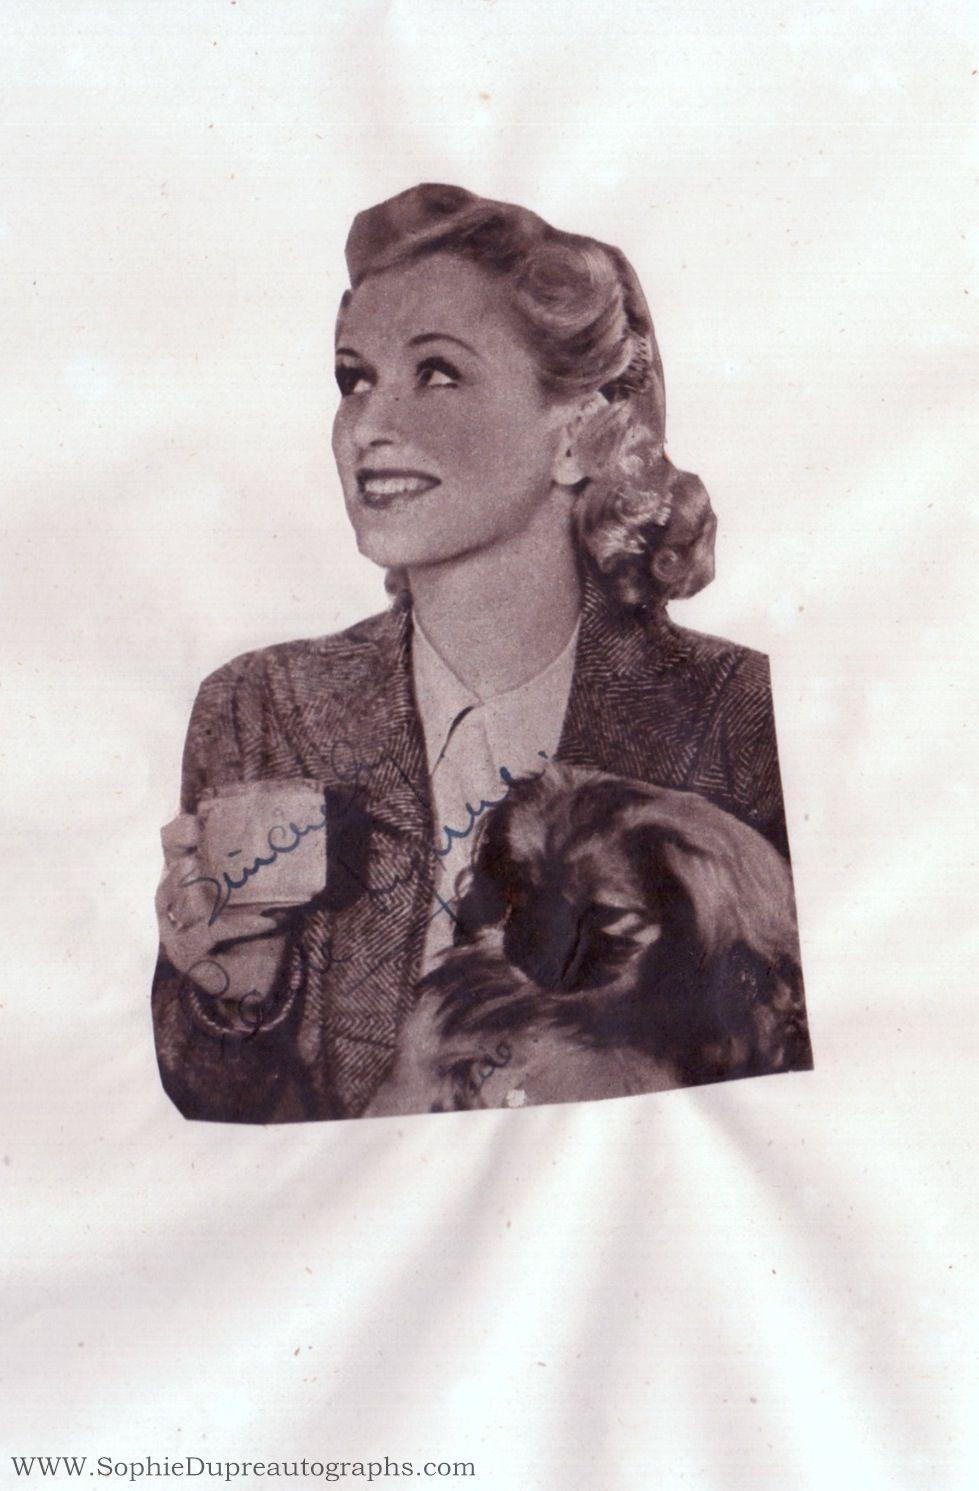 Signed Magazine Portrait Photograph, (Carole, 1918-2008, Revue Artiste & Actress, wife, 1946, of Bernard, Lord Delfont) LYNNE